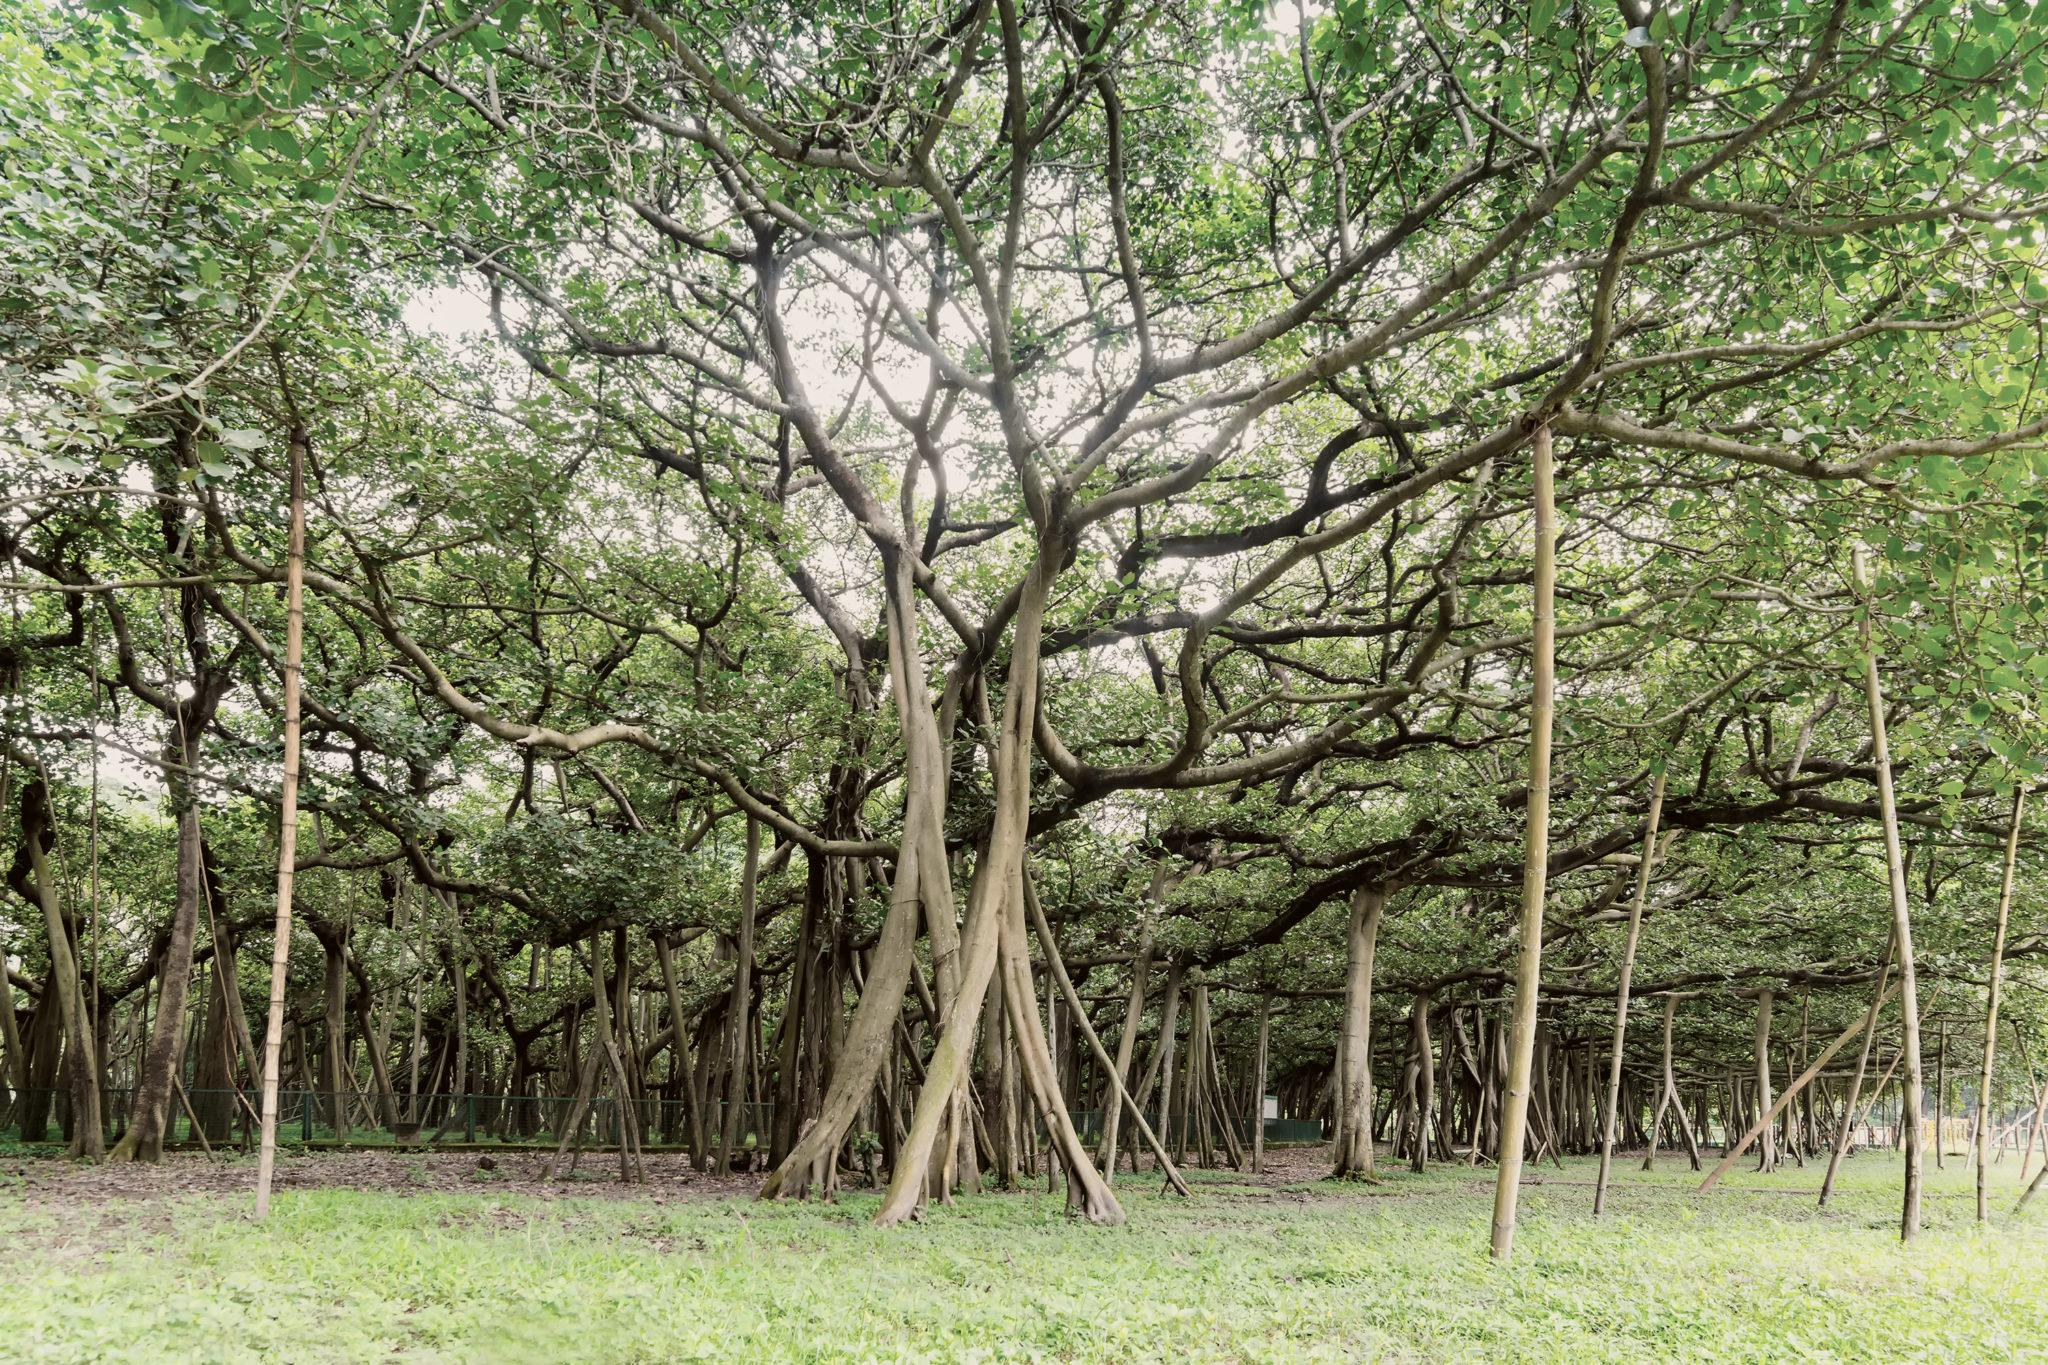 omg-facts-great-baniyan-tree-द ग्रेट बनियान ट्री